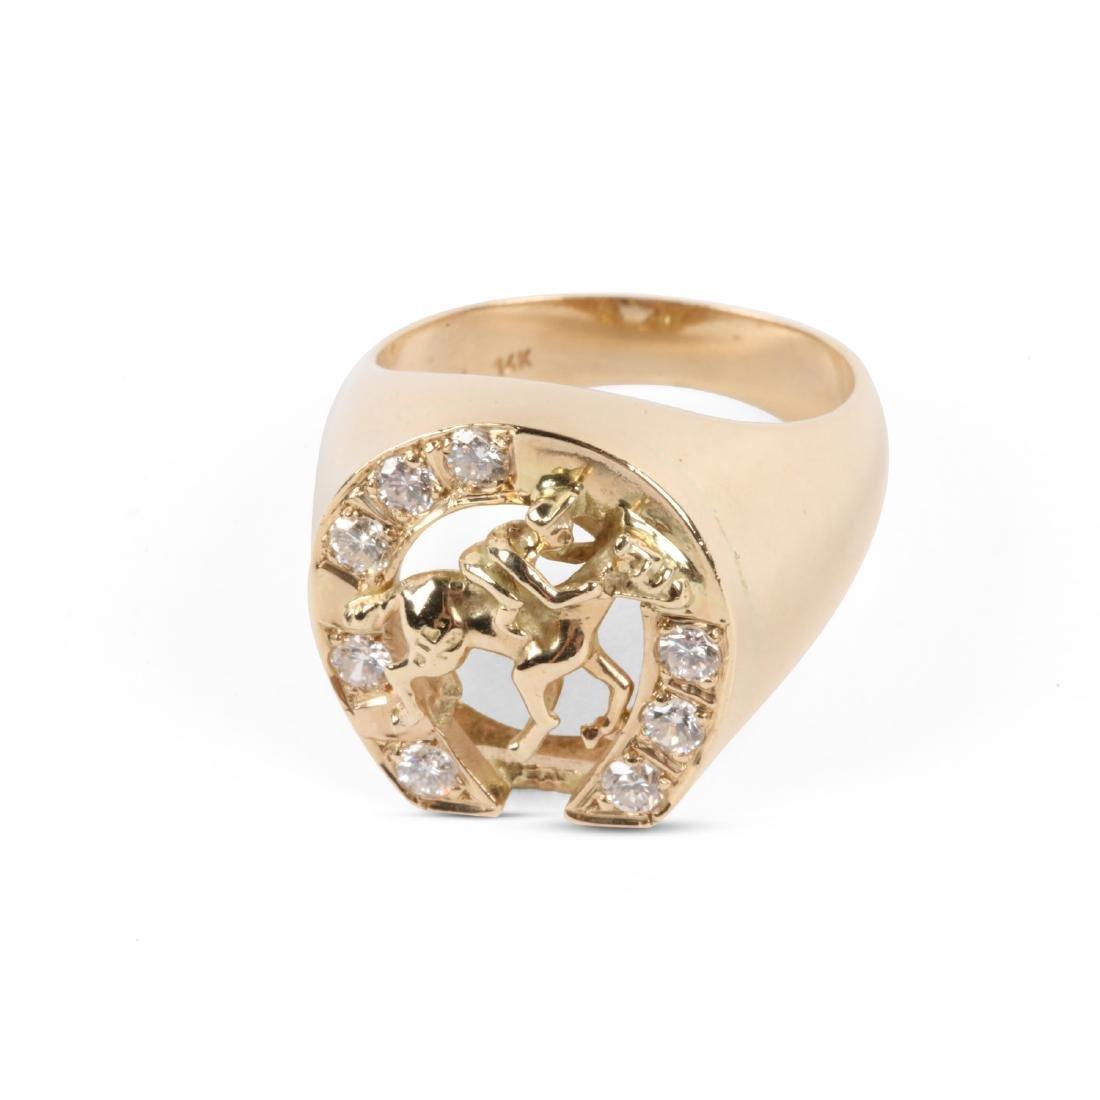 A Gent's 14K Gold & Diamond Jockey Ring